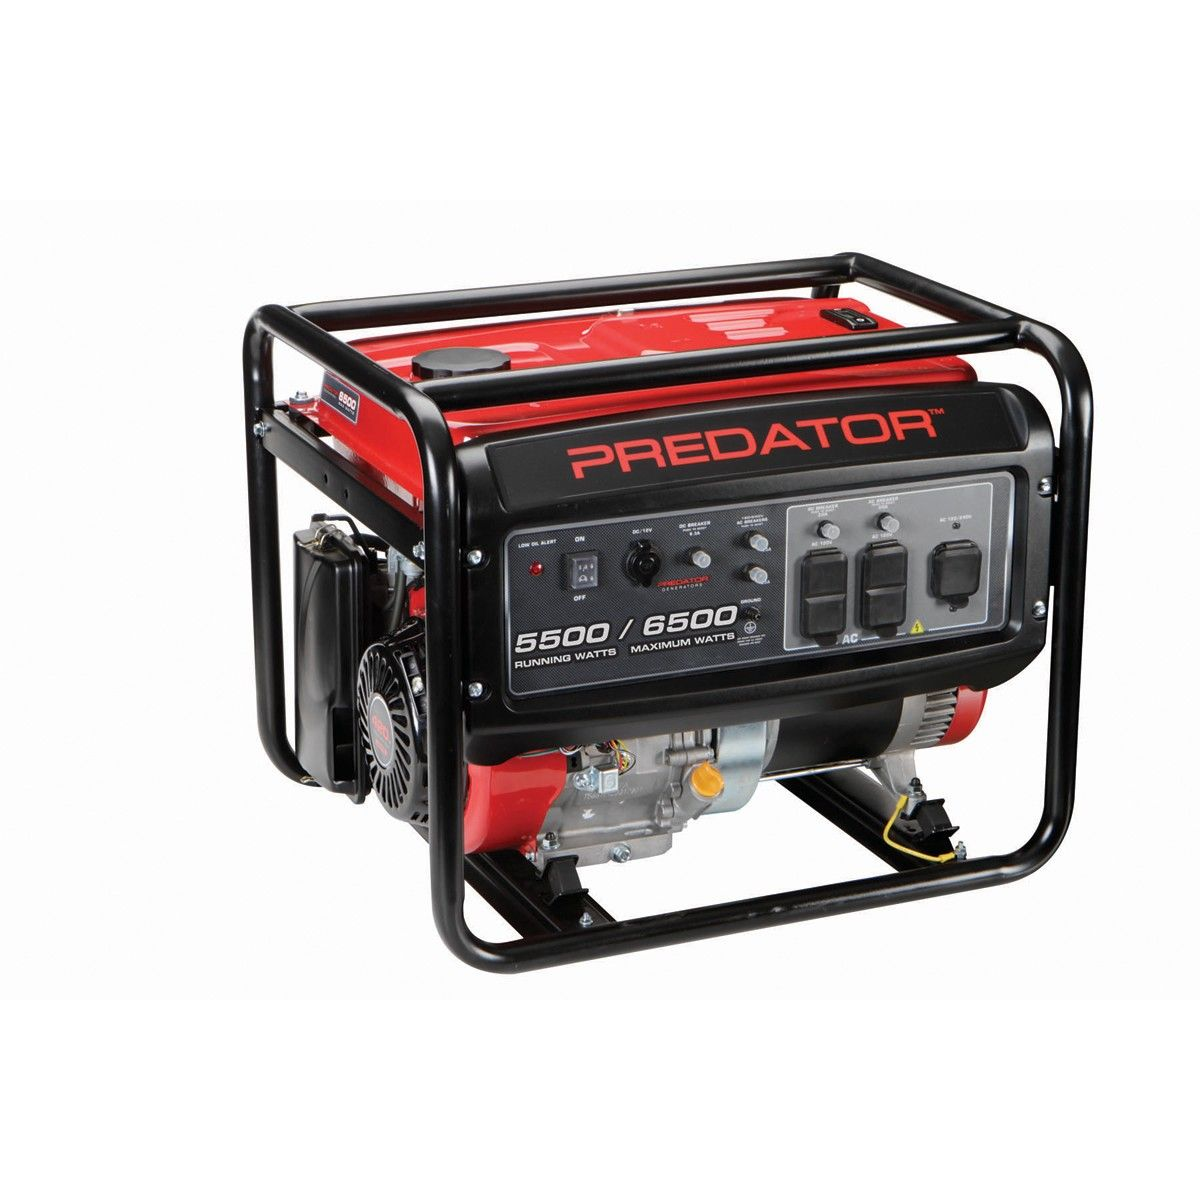 small resolution of predator generators 68529 420cc 6500 watts max 5500 watts rated portable generator